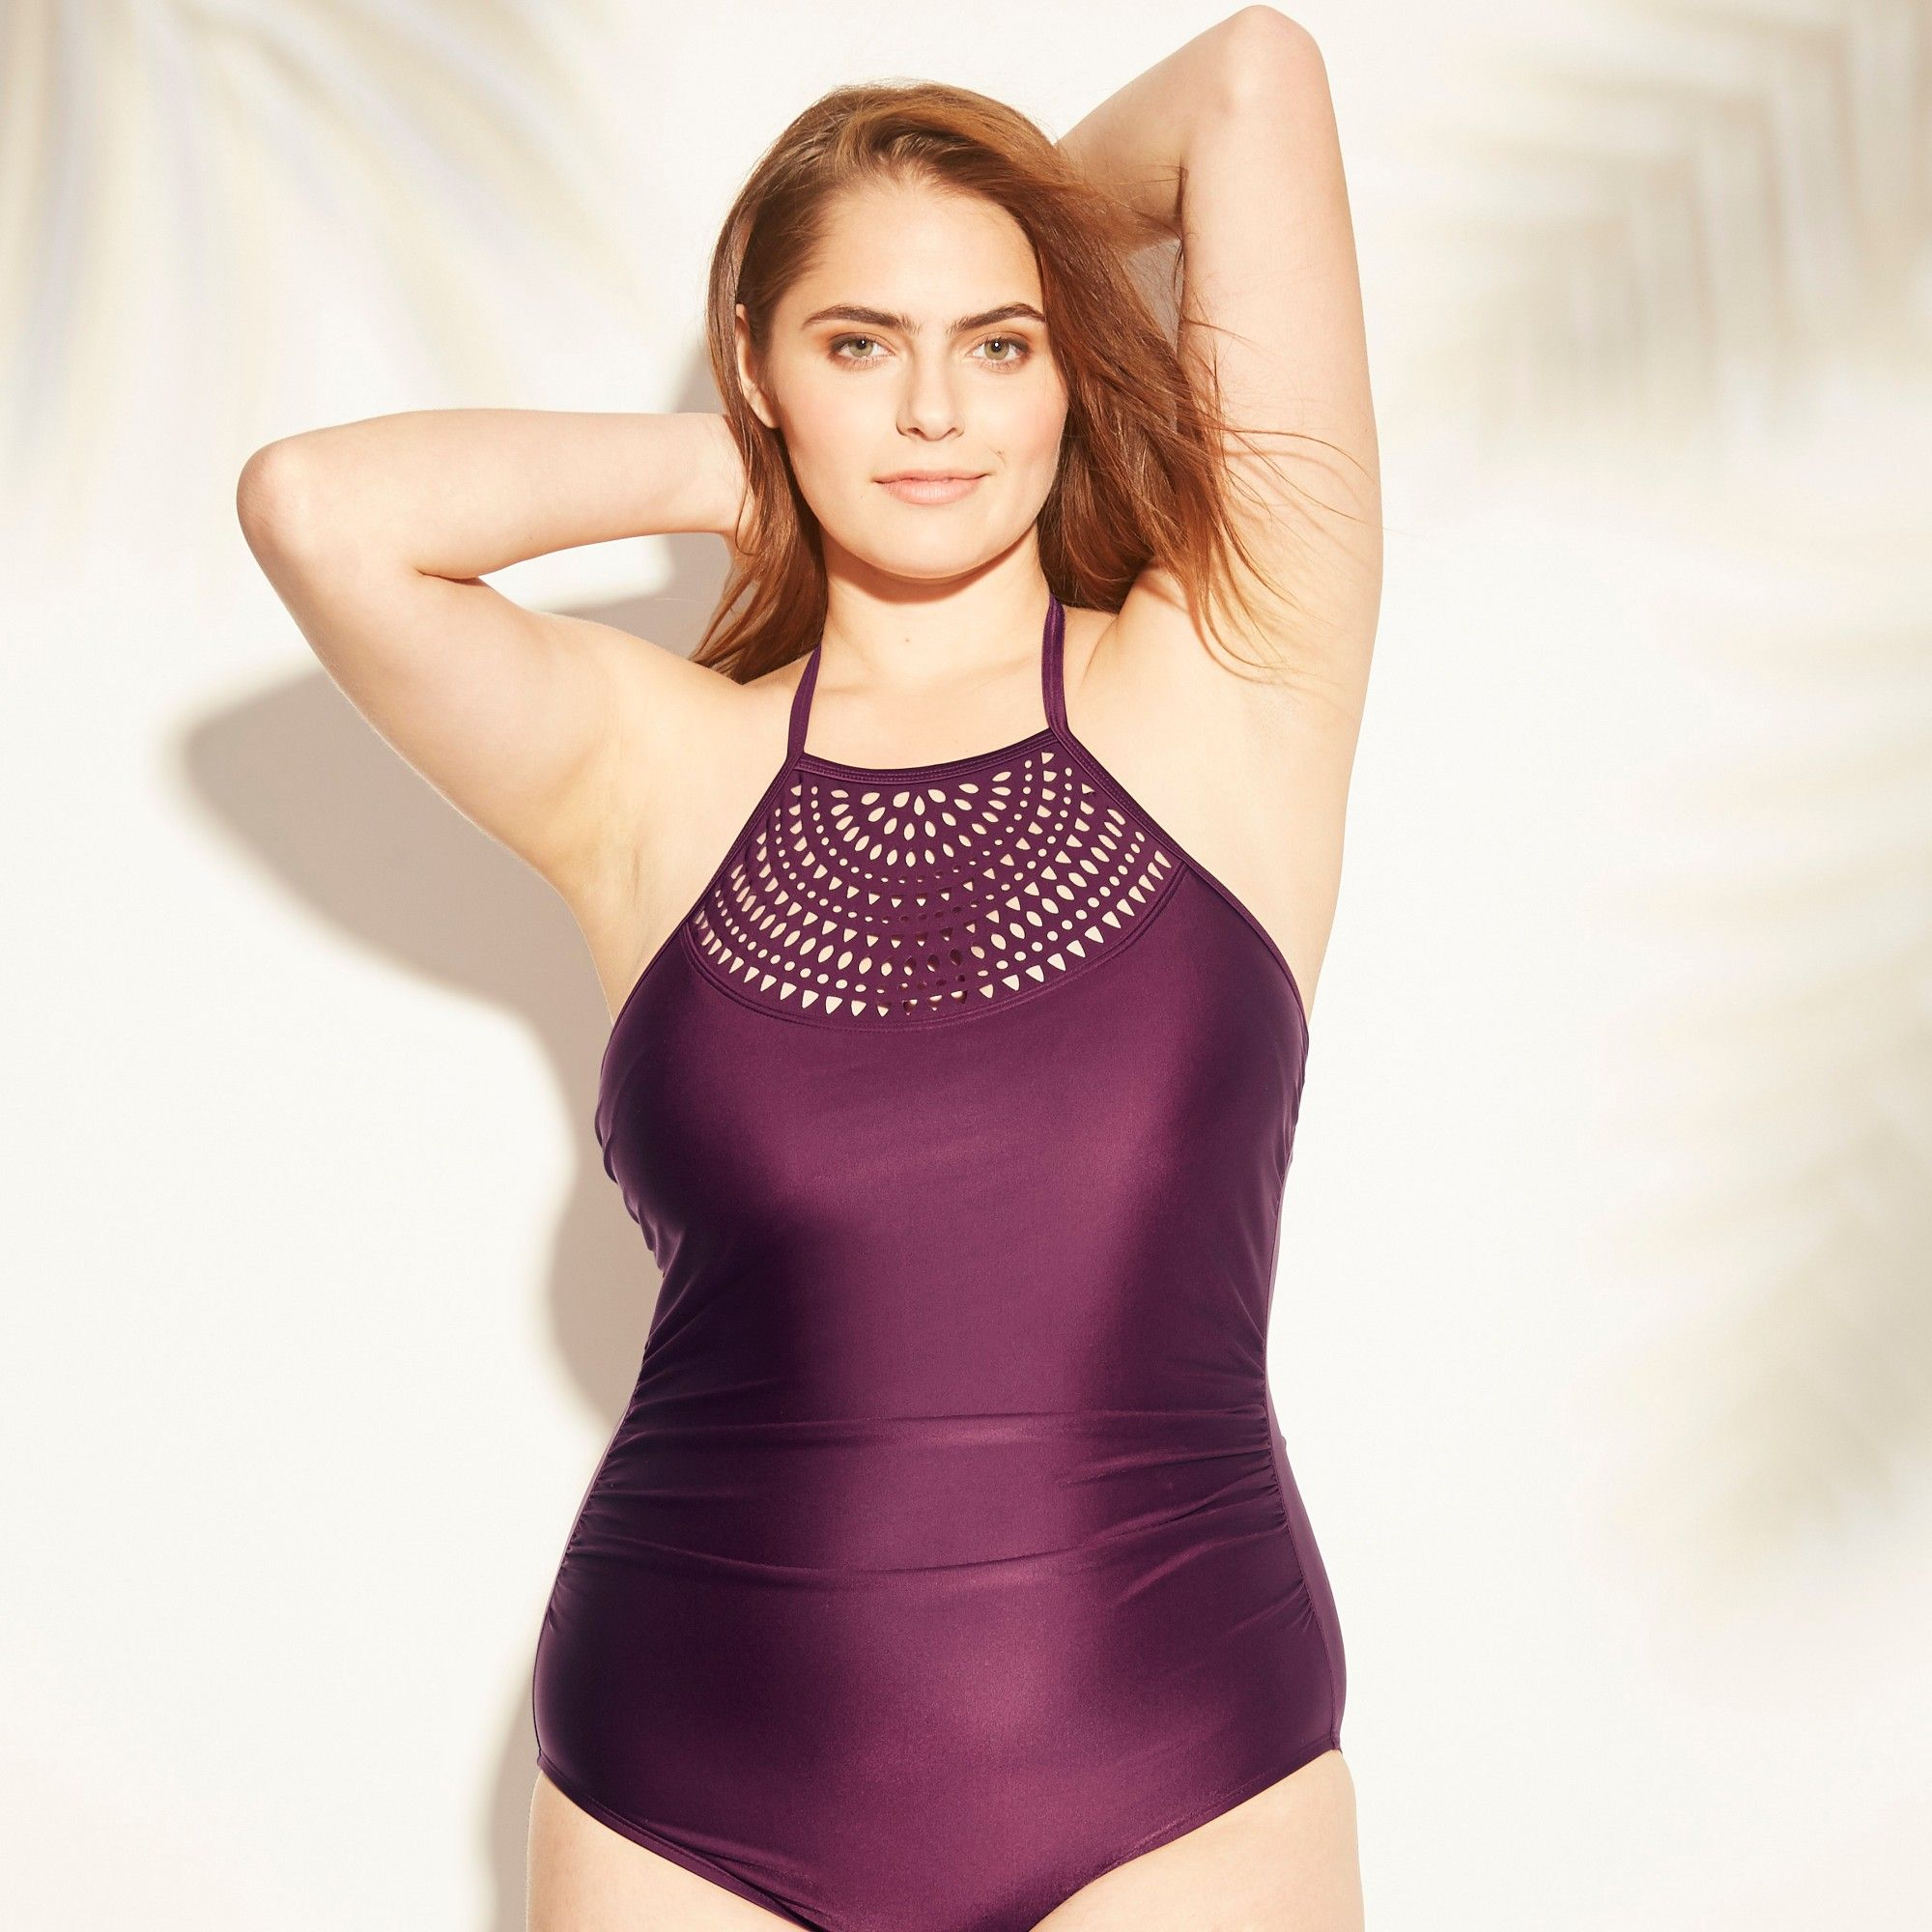 e6ef35583ab71 Women's Tall/Long Torso Laser Cut High Neck One Piece Swimsuit - Kona Sol  Atlantic Burgundy M, Red